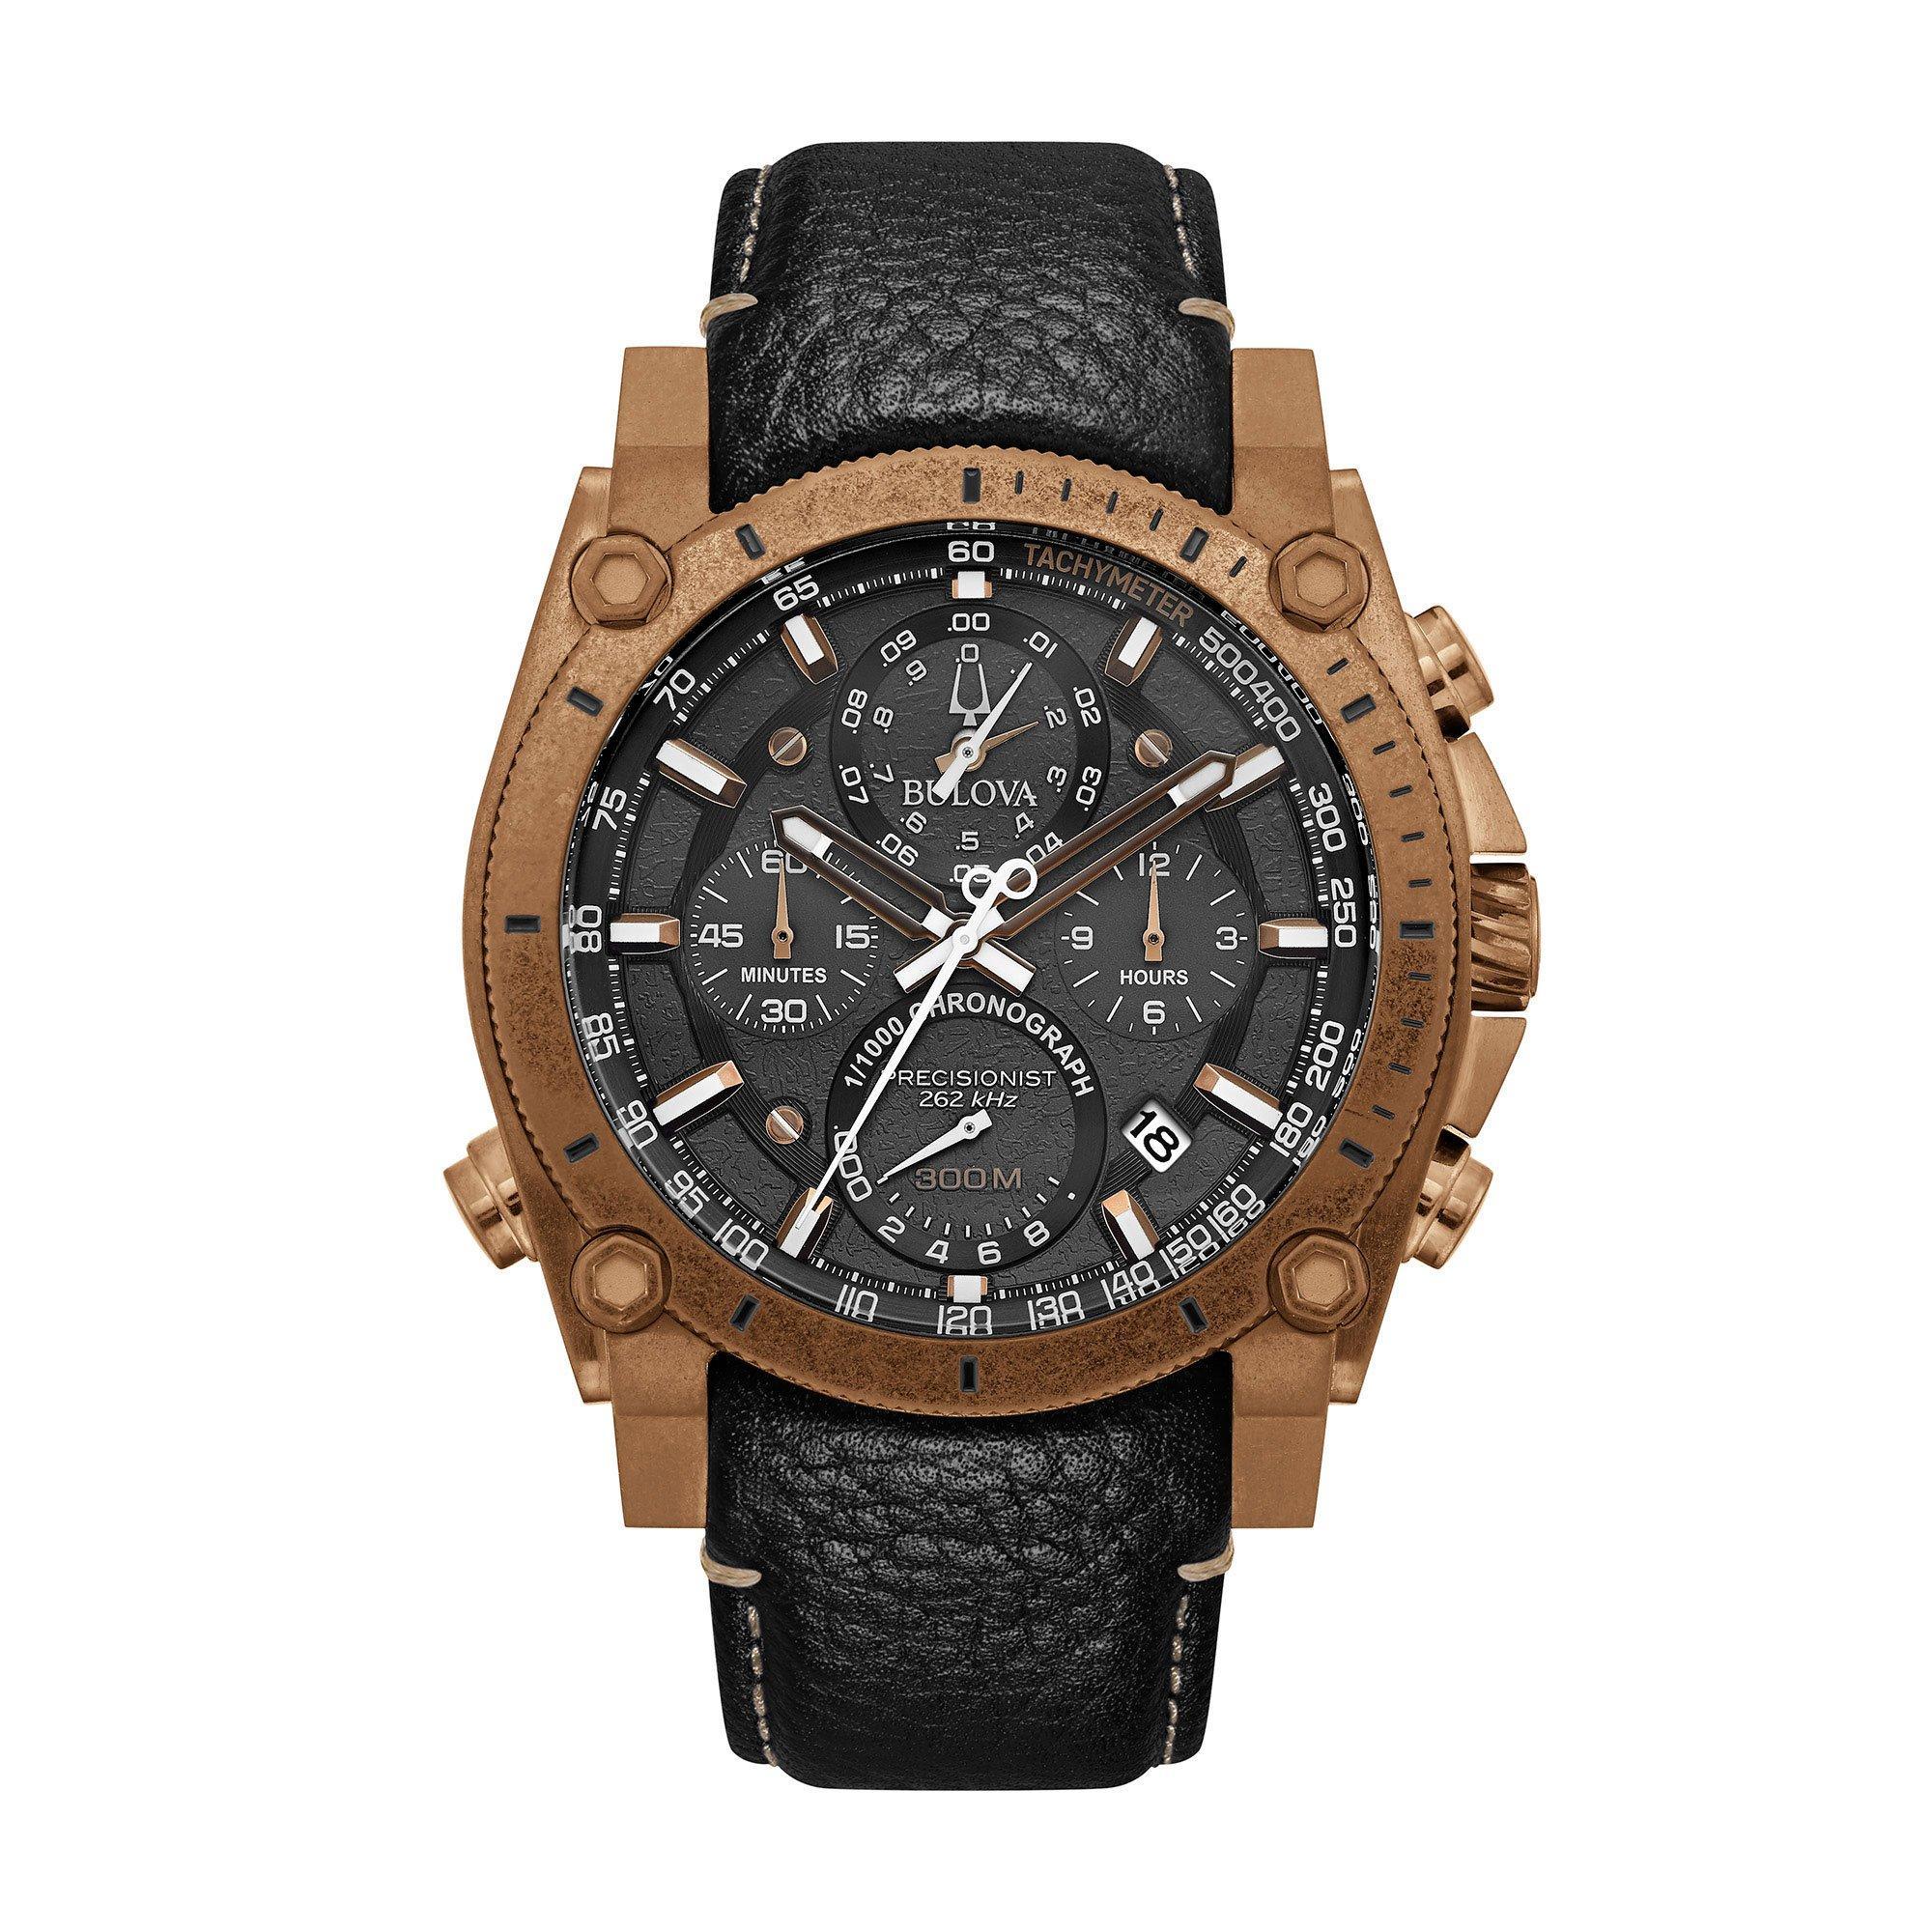 Bulova Precisionist Bronze IP Chronograph Men's Watch